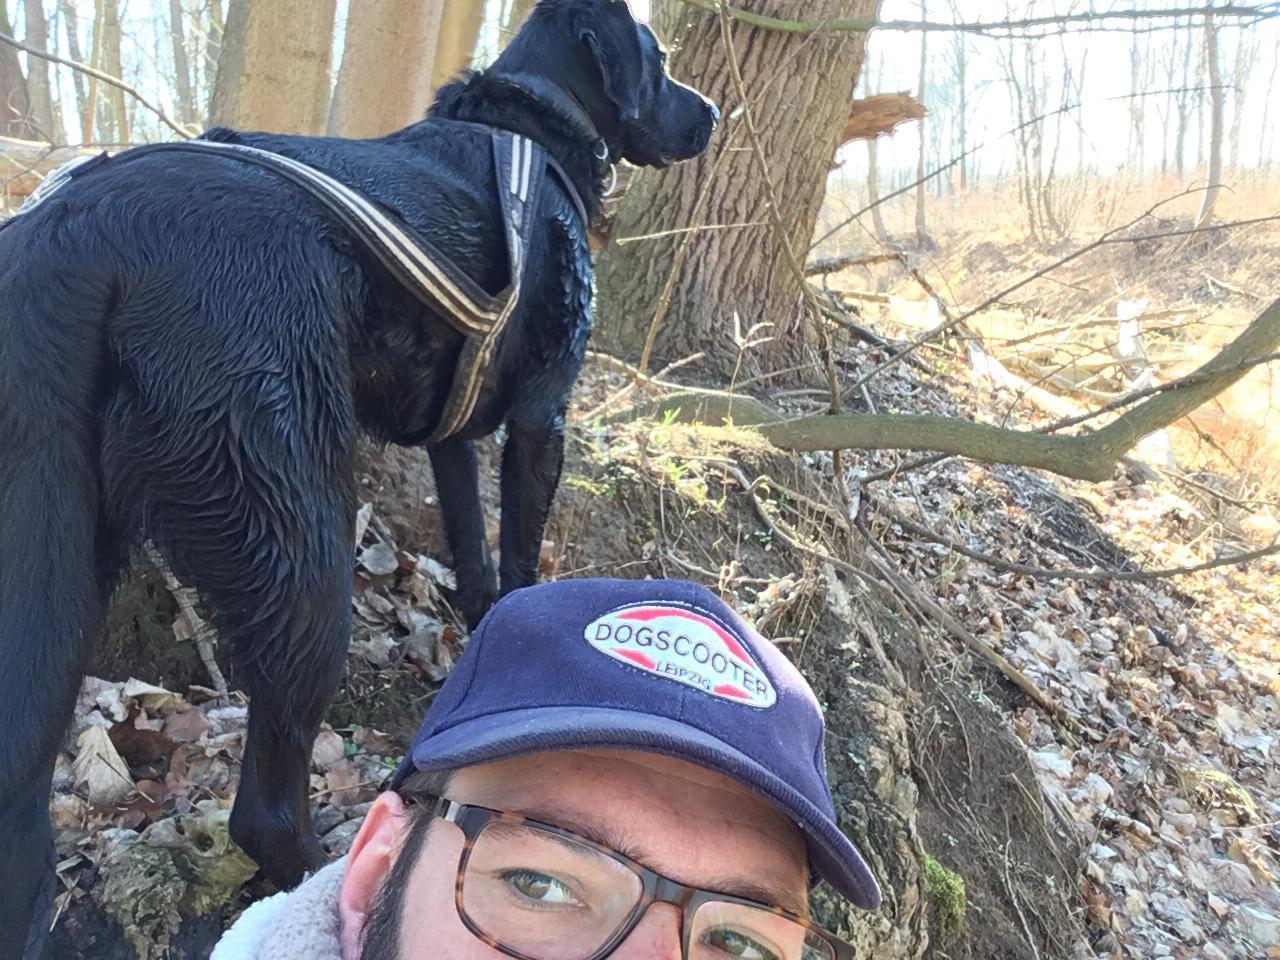 Dogscootern ideal für lauffreudige Hunde!